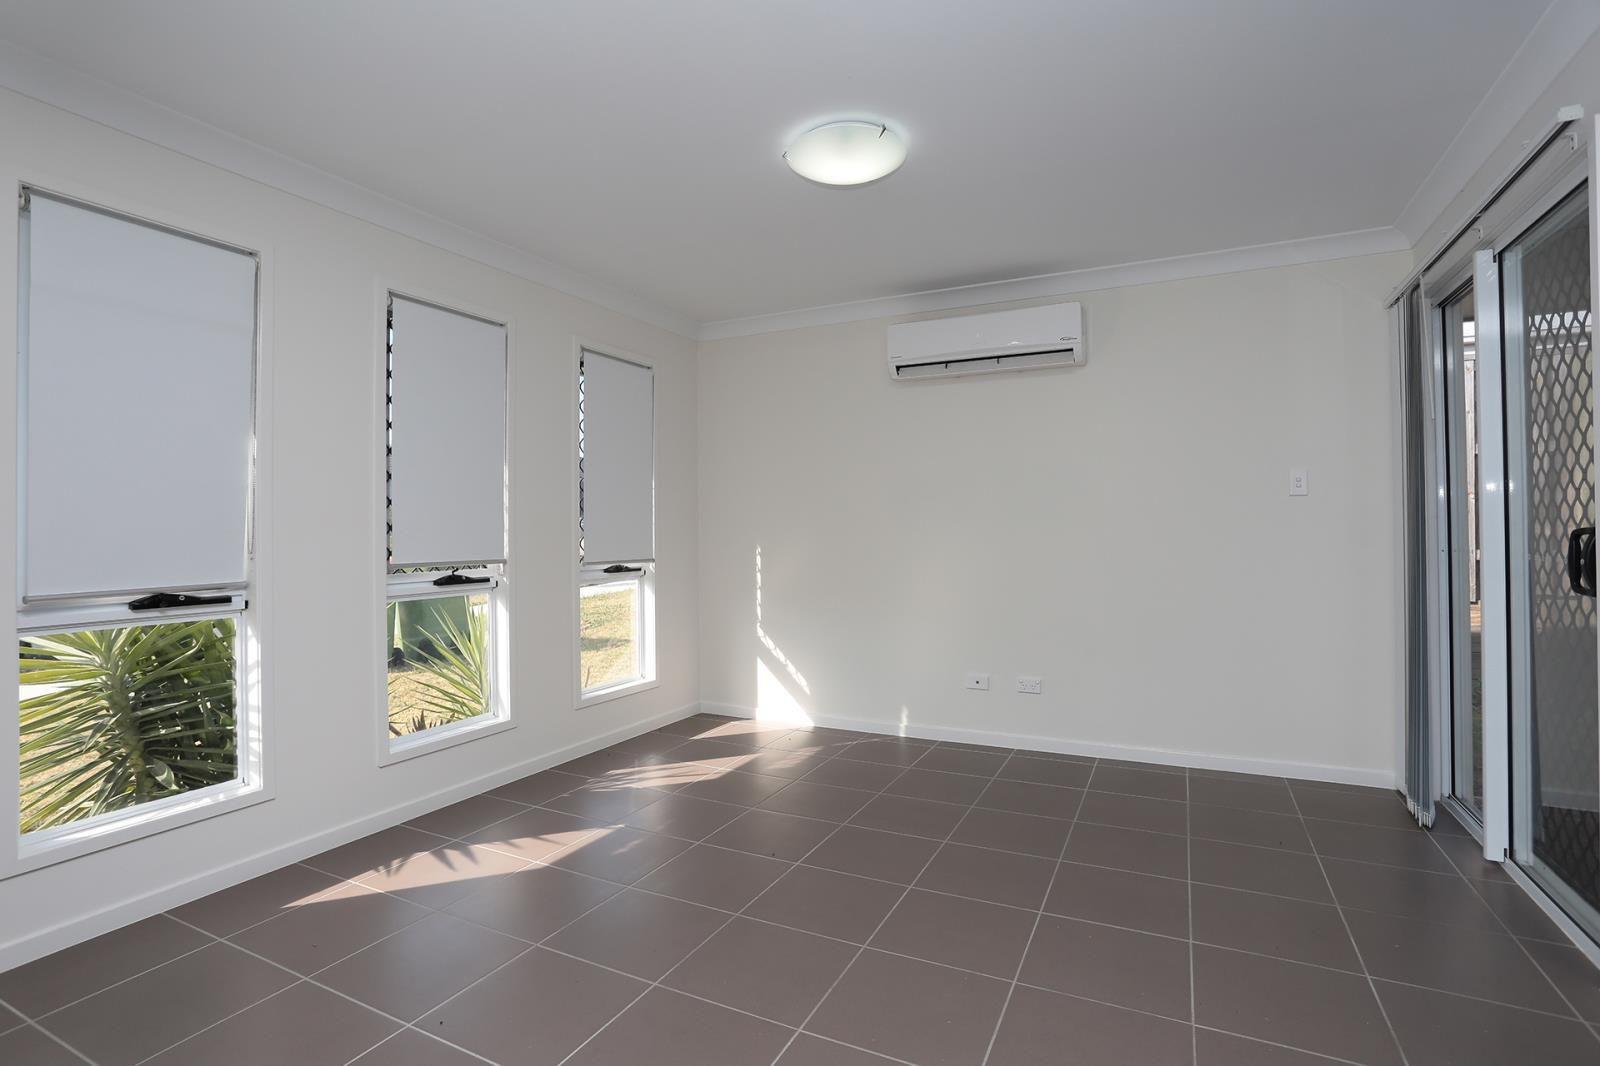 2/5 Melville Drive, Brassall QLD 4305, Image 2